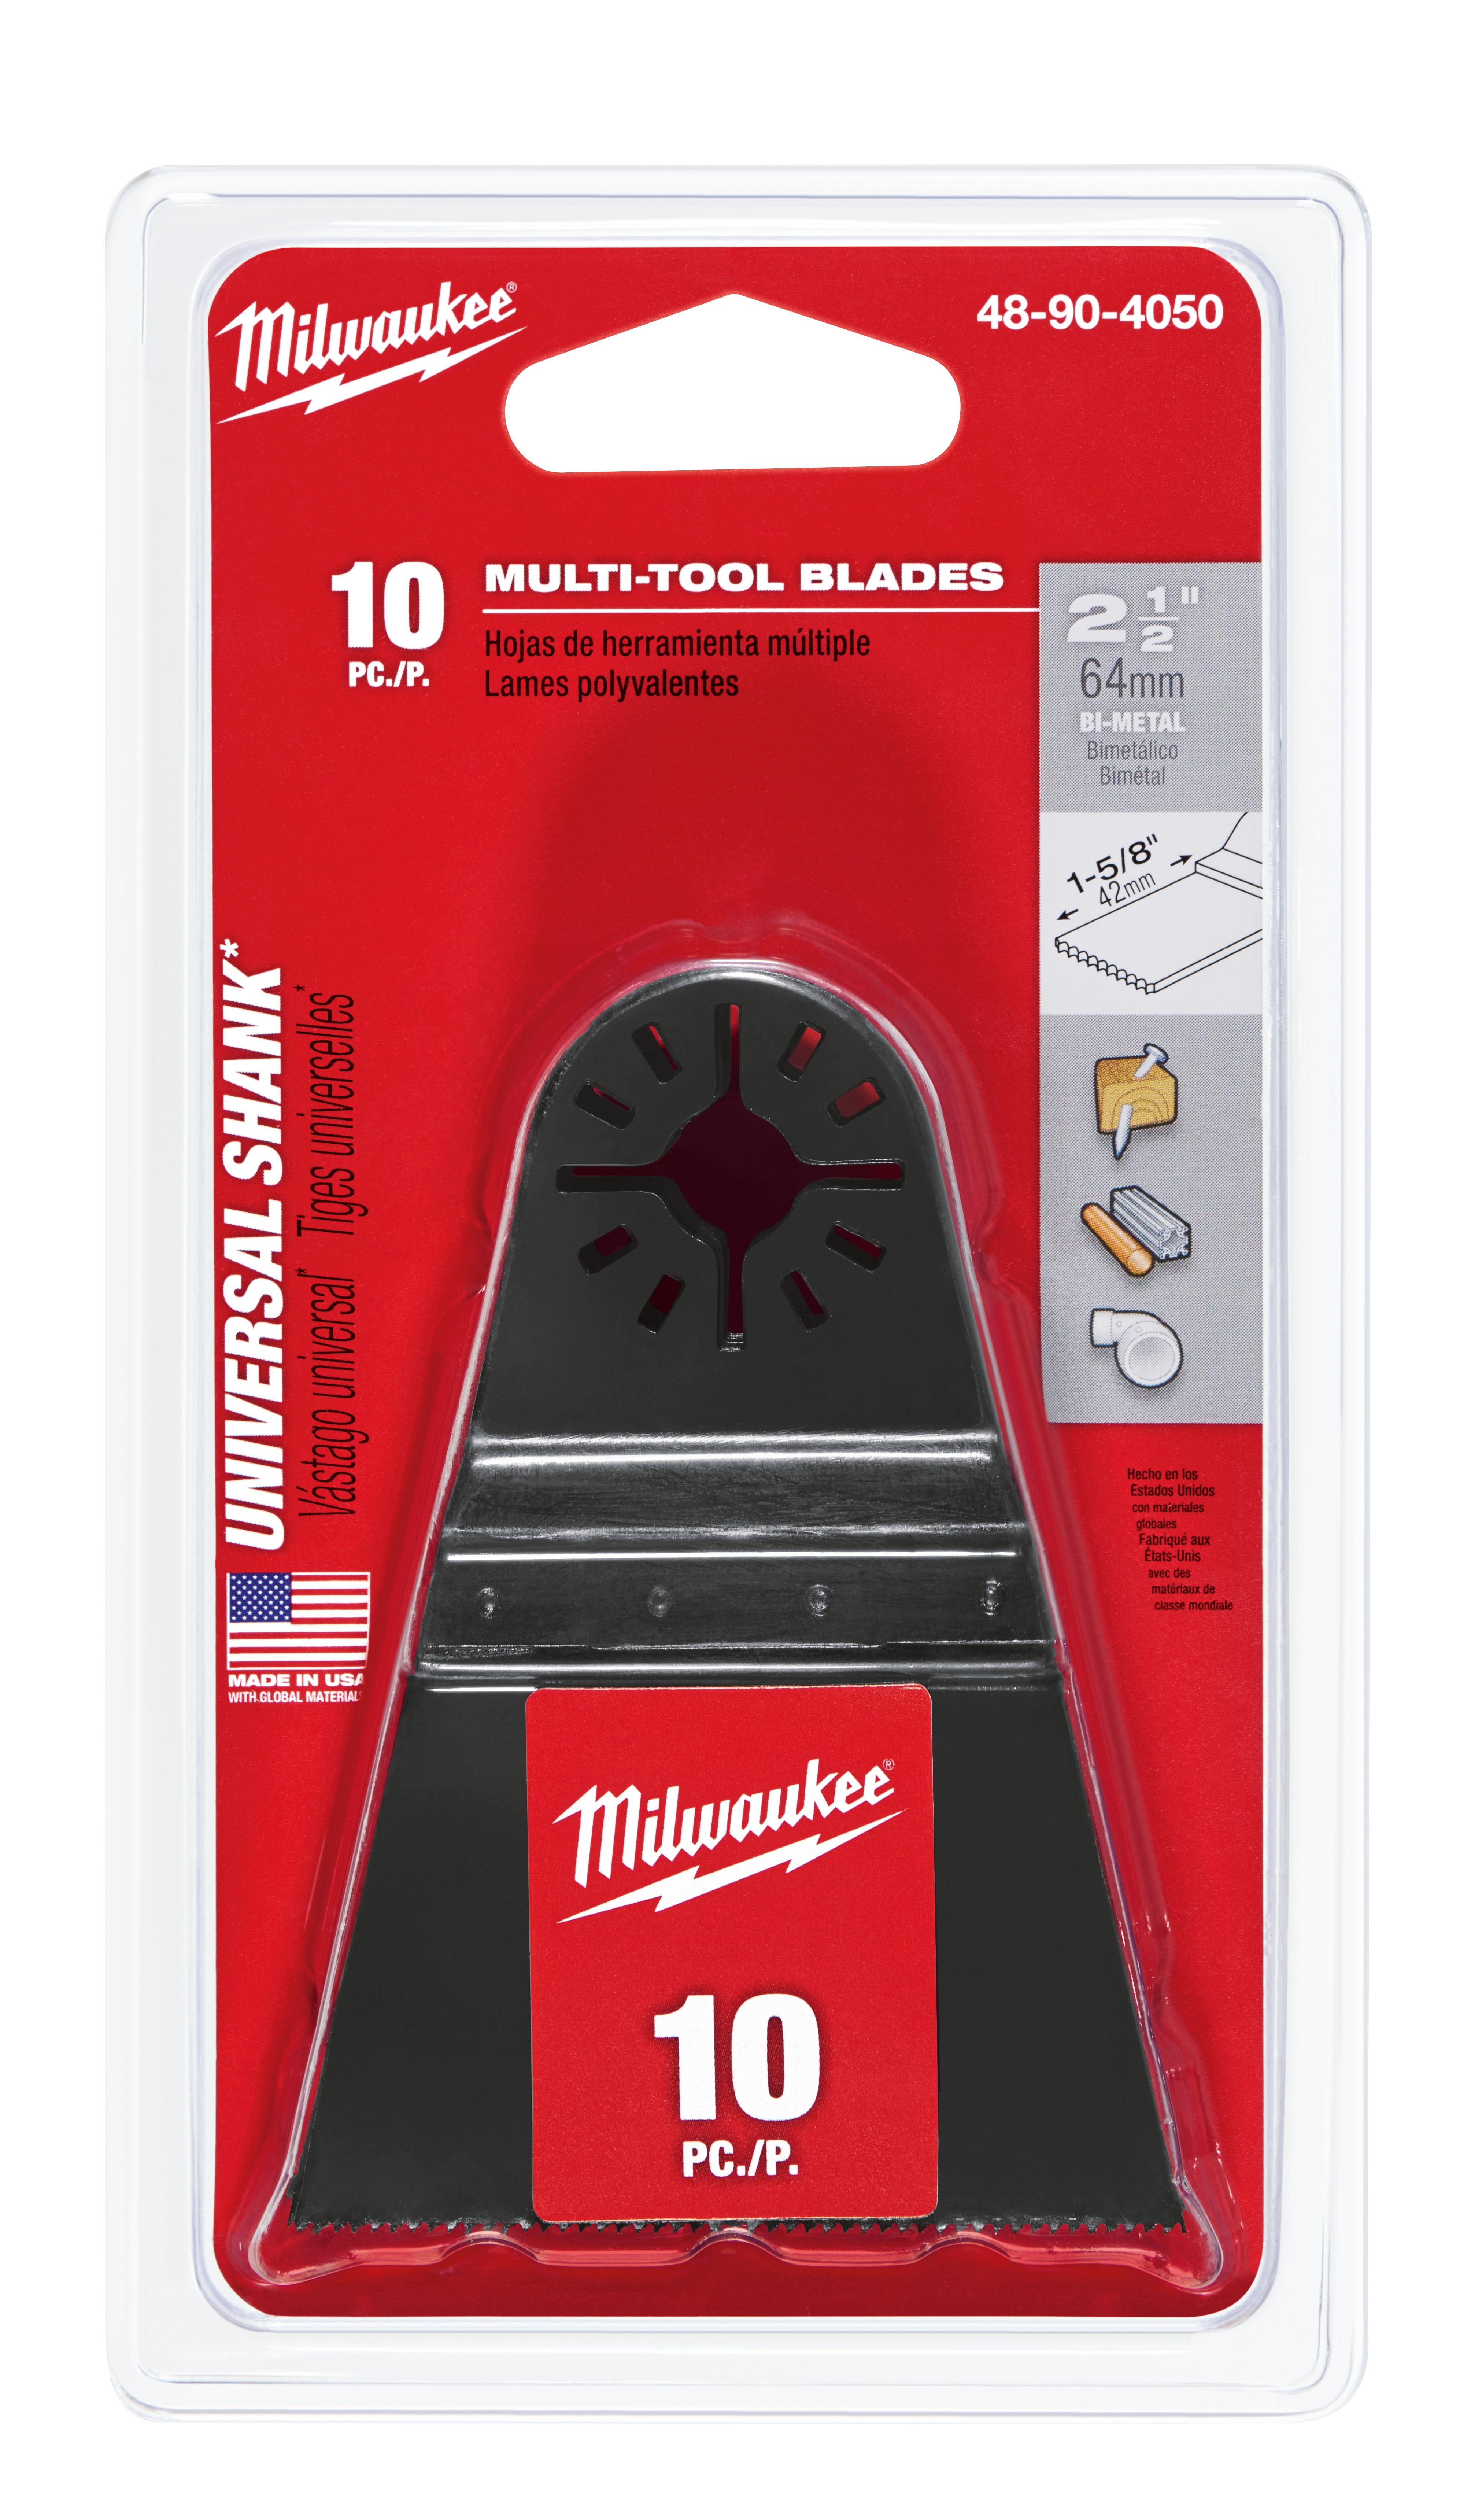 Milwaukee® 48-90-4050 Multi-Tool Blade With Universal Shank, For Use With Milwaukee®, Bosch® (Non-Starlock™), SKIL®, Makita®, Craftsman®, Fein® (Non-Starlock™), Ridgid®, AEG®, Ozito® and Ryobi® Professional Grade Oscillating Multi-Tool, 2-1/2 in, Bi-Metal